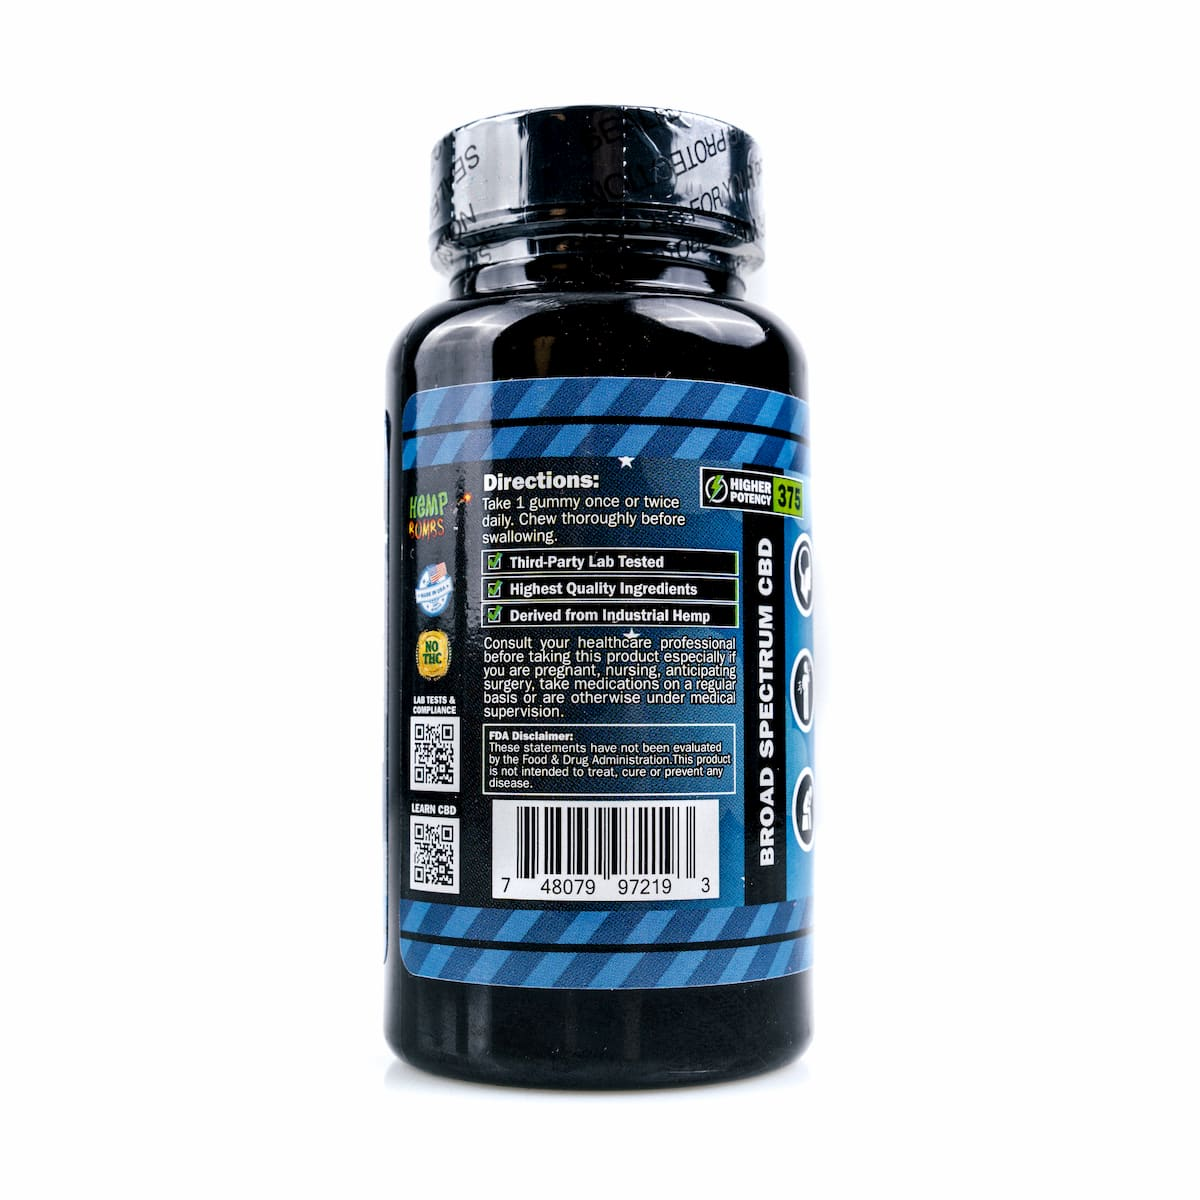 Hemp Bombs, CBD Sleep Gummies with Melatonin, Broad Spectrum THC-free, 25 Count, 375mg of CBD2